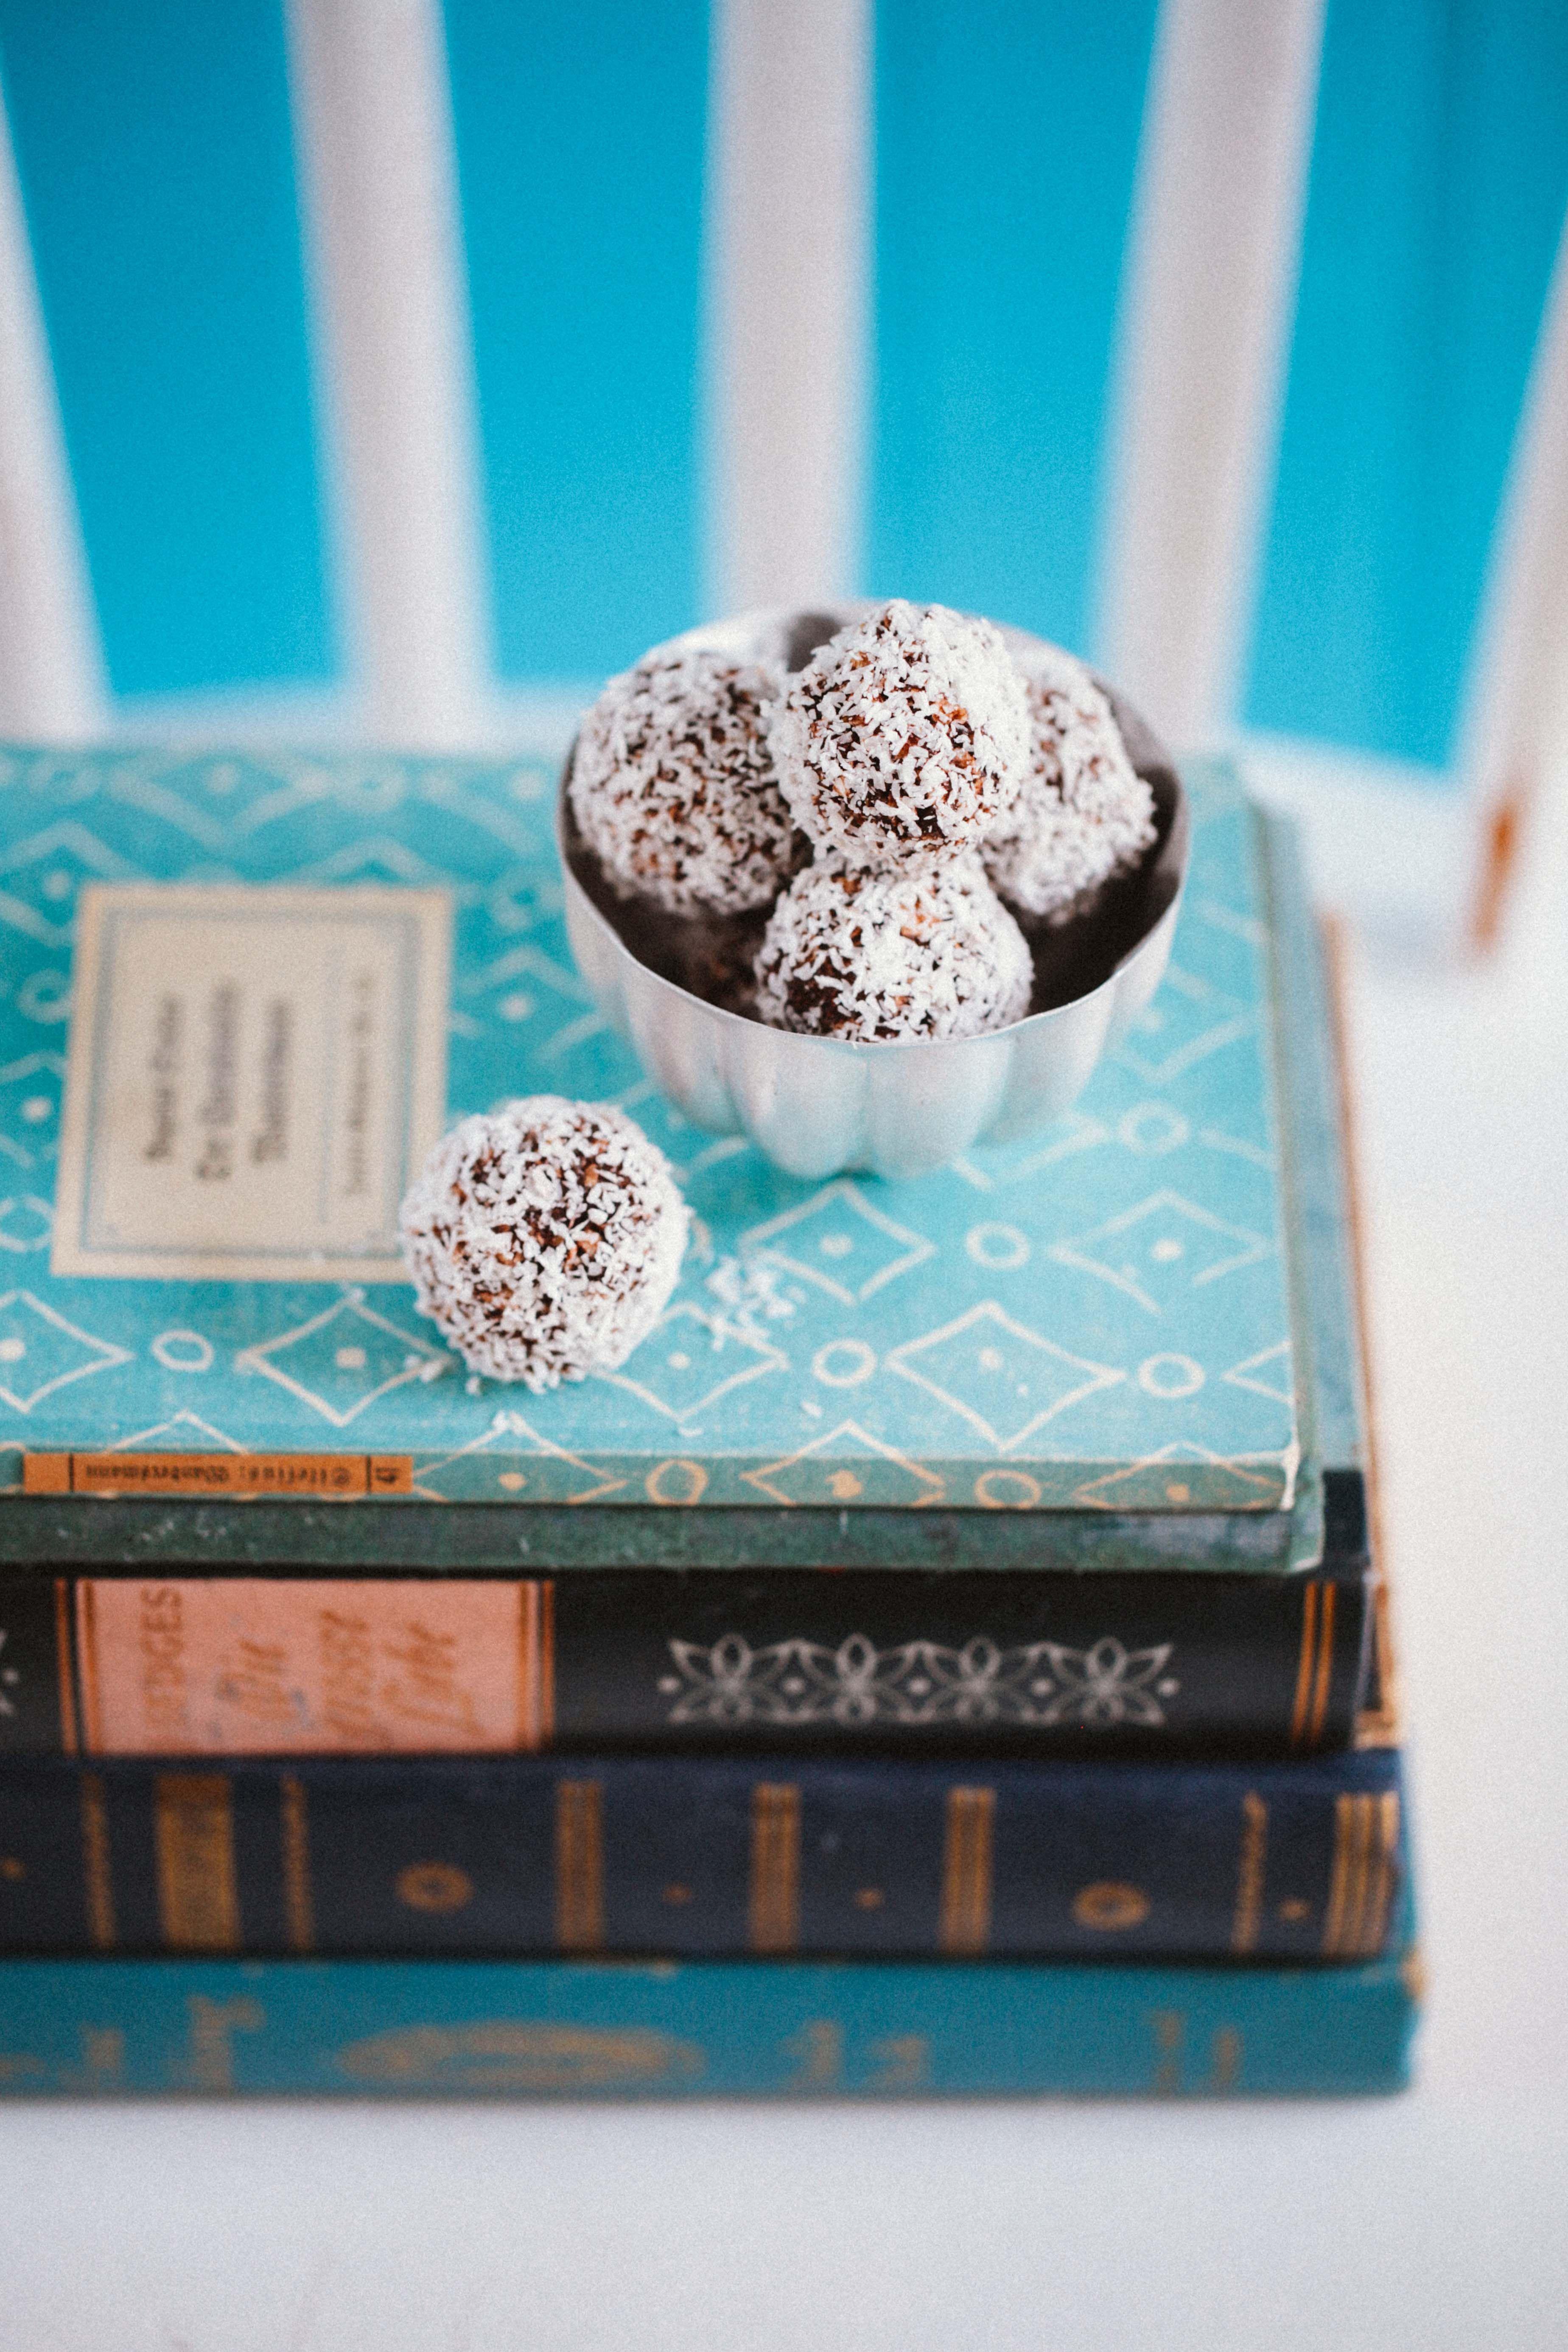 rezept f r schwedisches schokoladen kokoskonfekt chokladbollar rezept gerichte. Black Bedroom Furniture Sets. Home Design Ideas